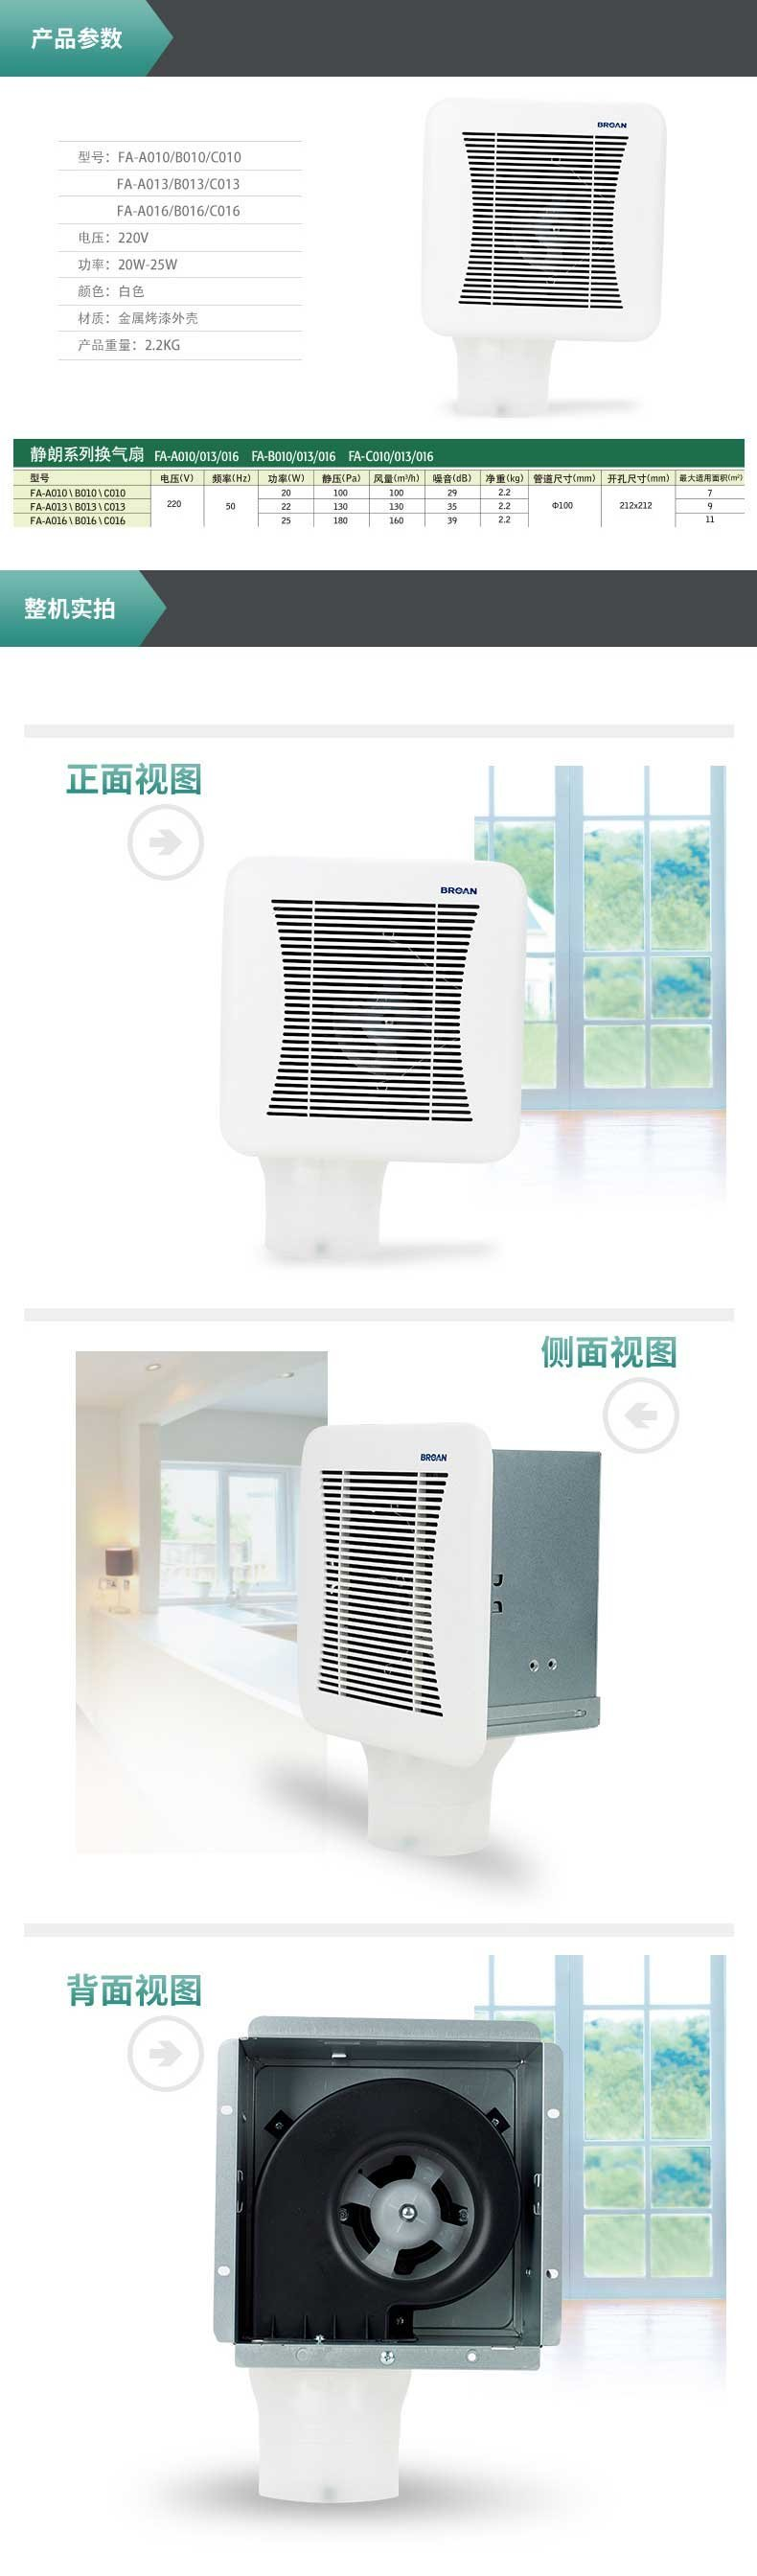 broan kitchen exhaust fan install cabinets 美国broan 百朗静朗吊顶换气扇卫生间排气扇厨房静音大功率fa b013 供应商 b01fcwiu5m